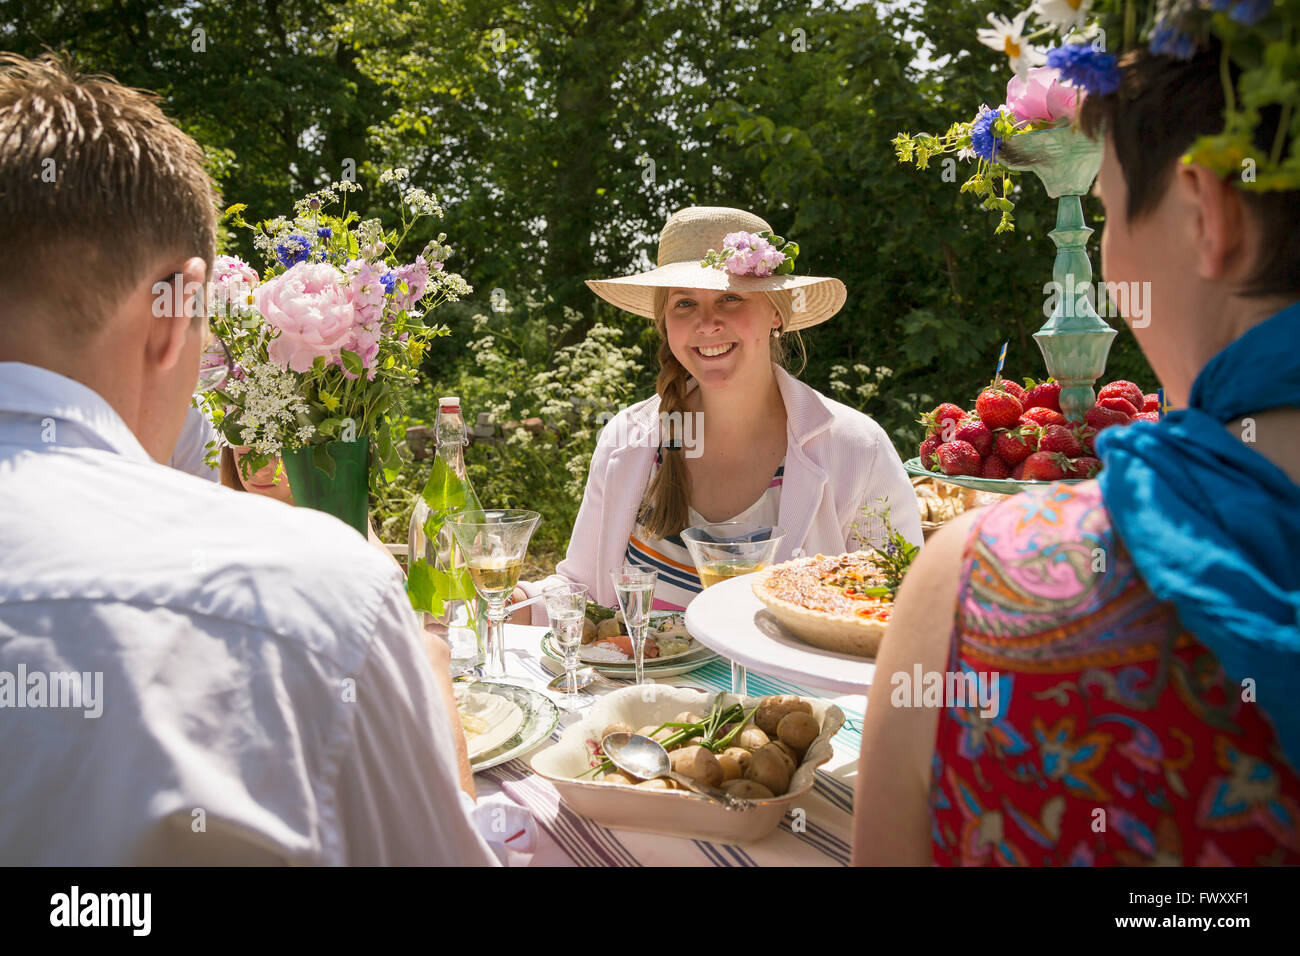 Sweden, Skane, Family during midsummer celebrations - Stock Image